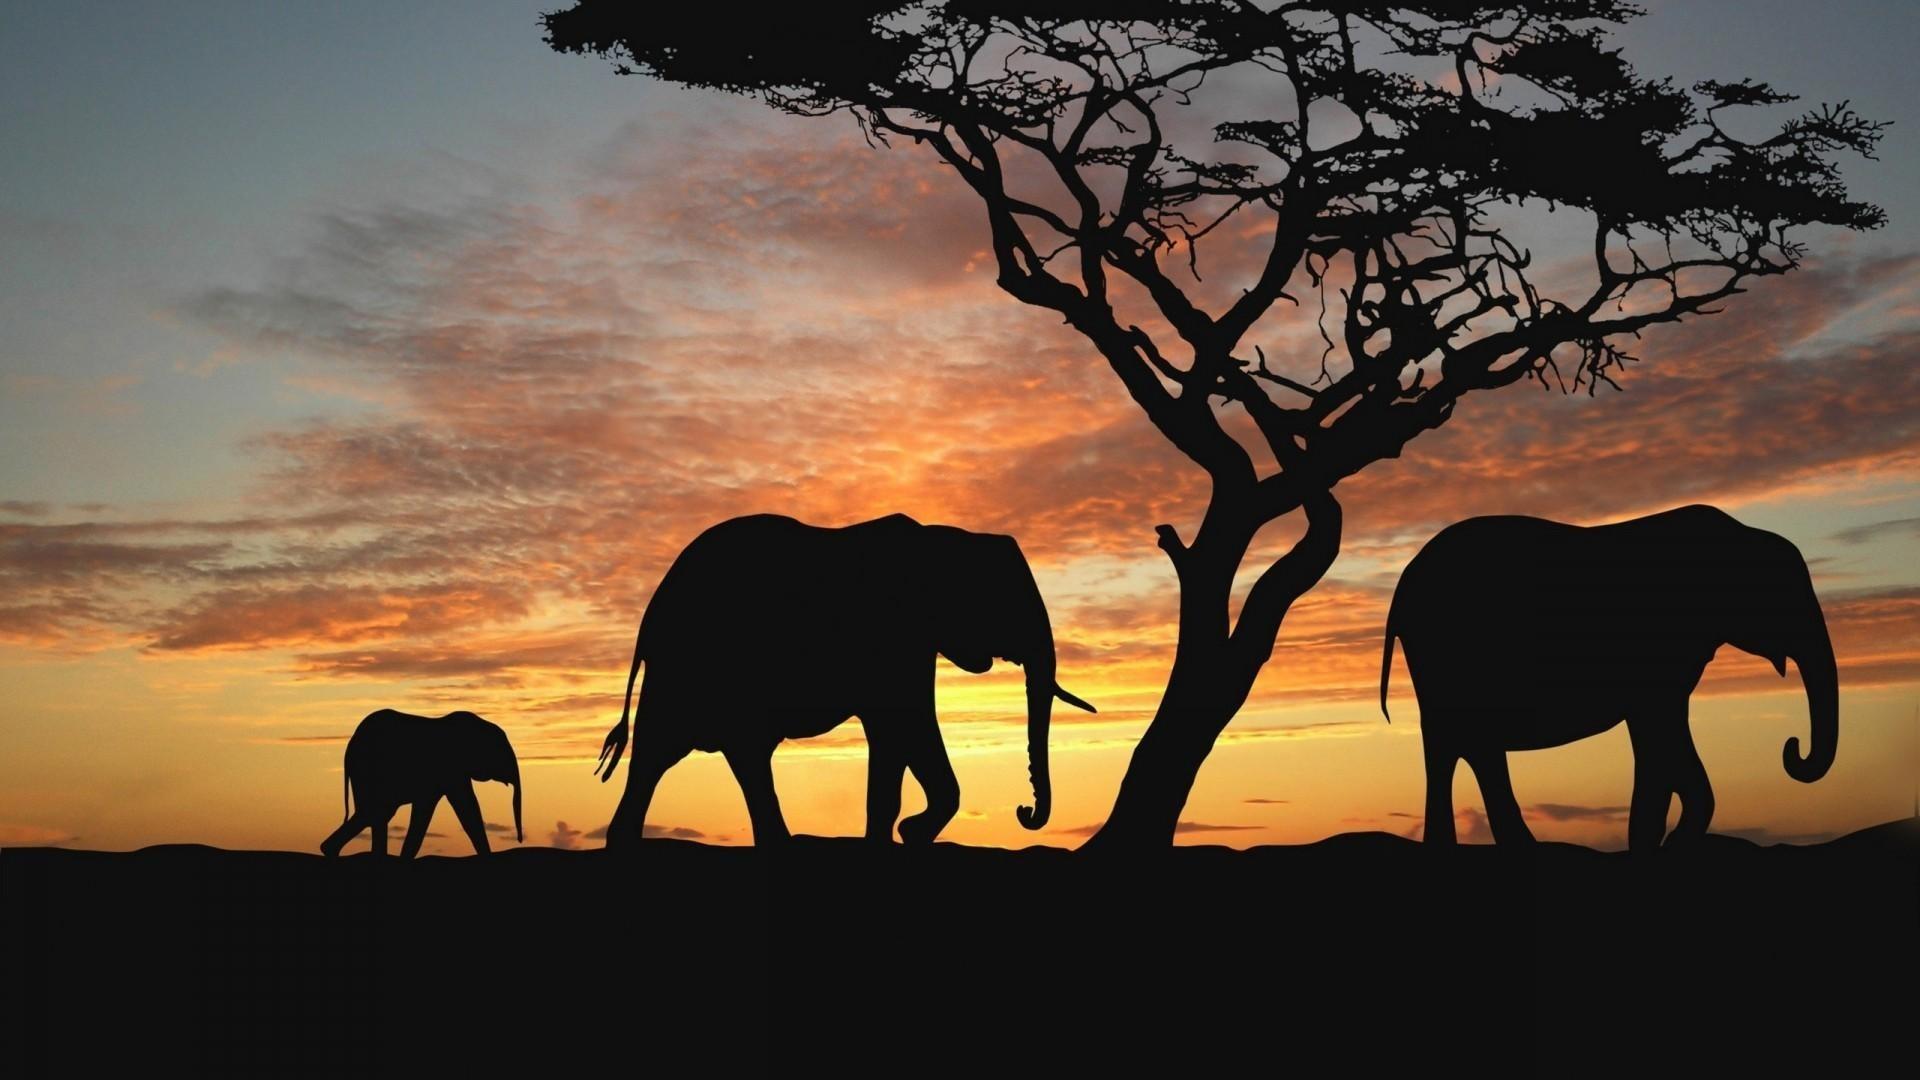 Baby elephants wallpaper - photo#42